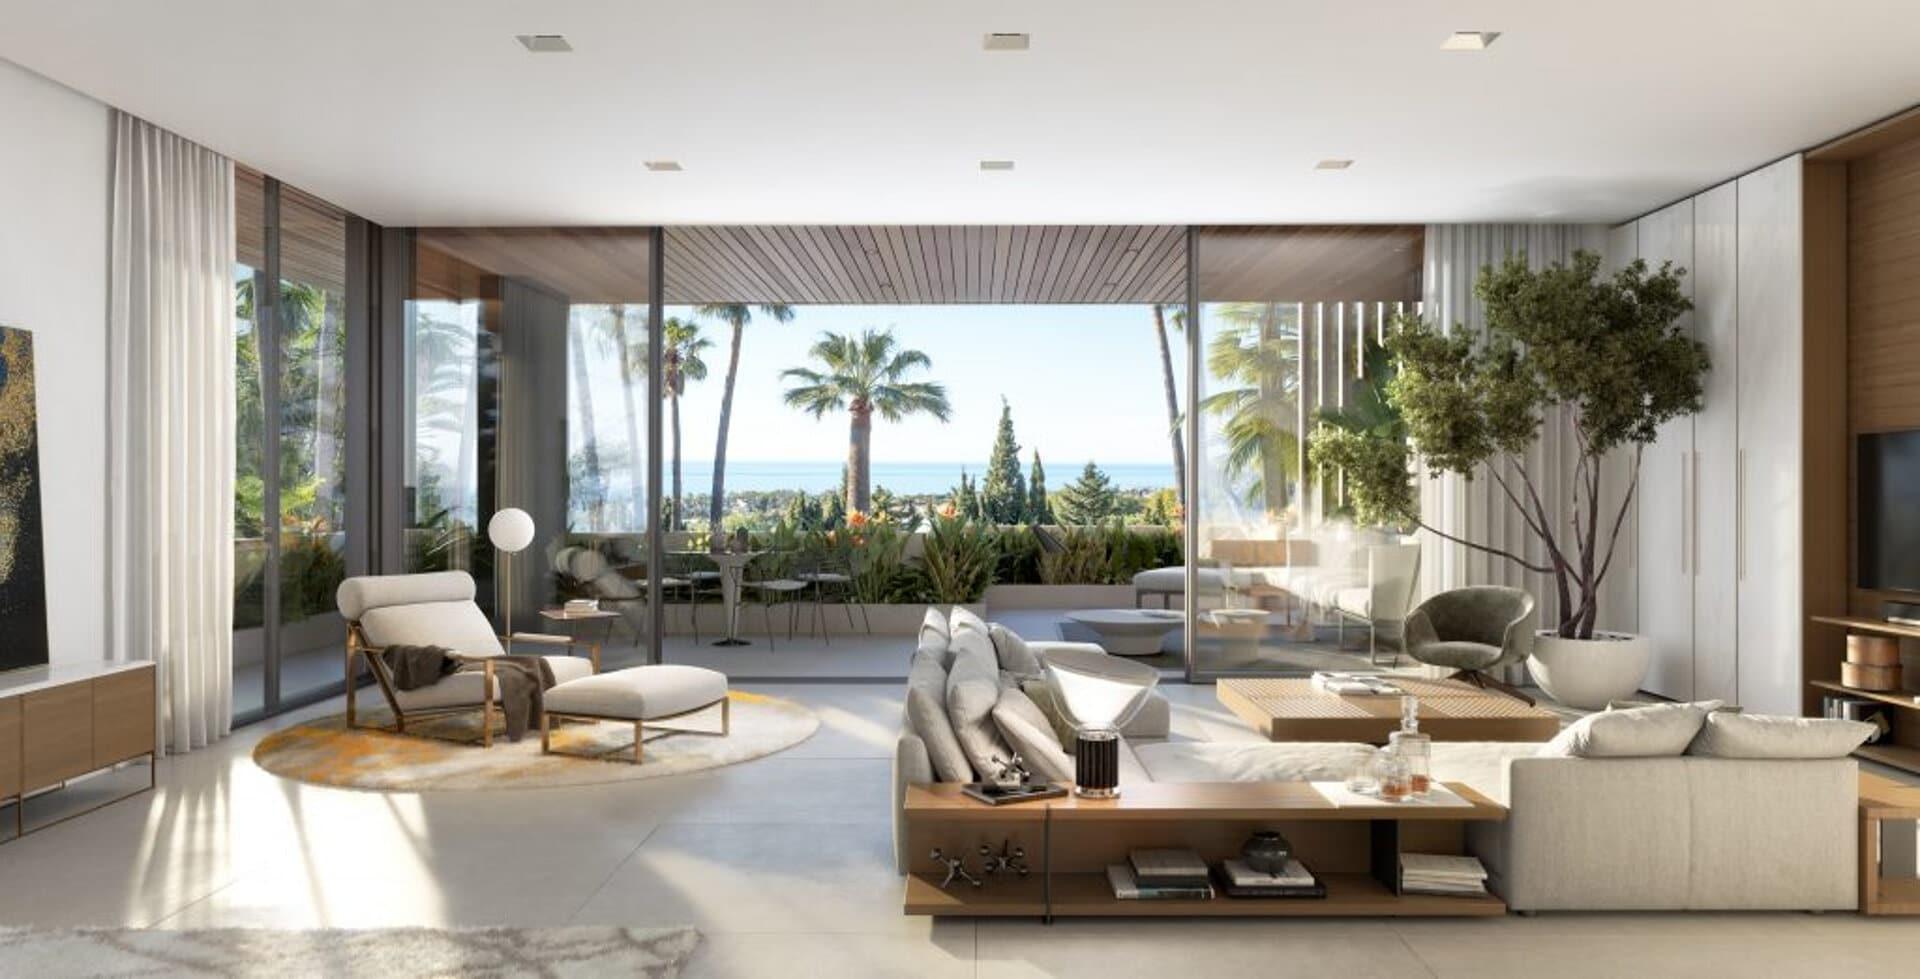 Le Blanca new villa in Sierra Blanca Marbella offers amazing sea views